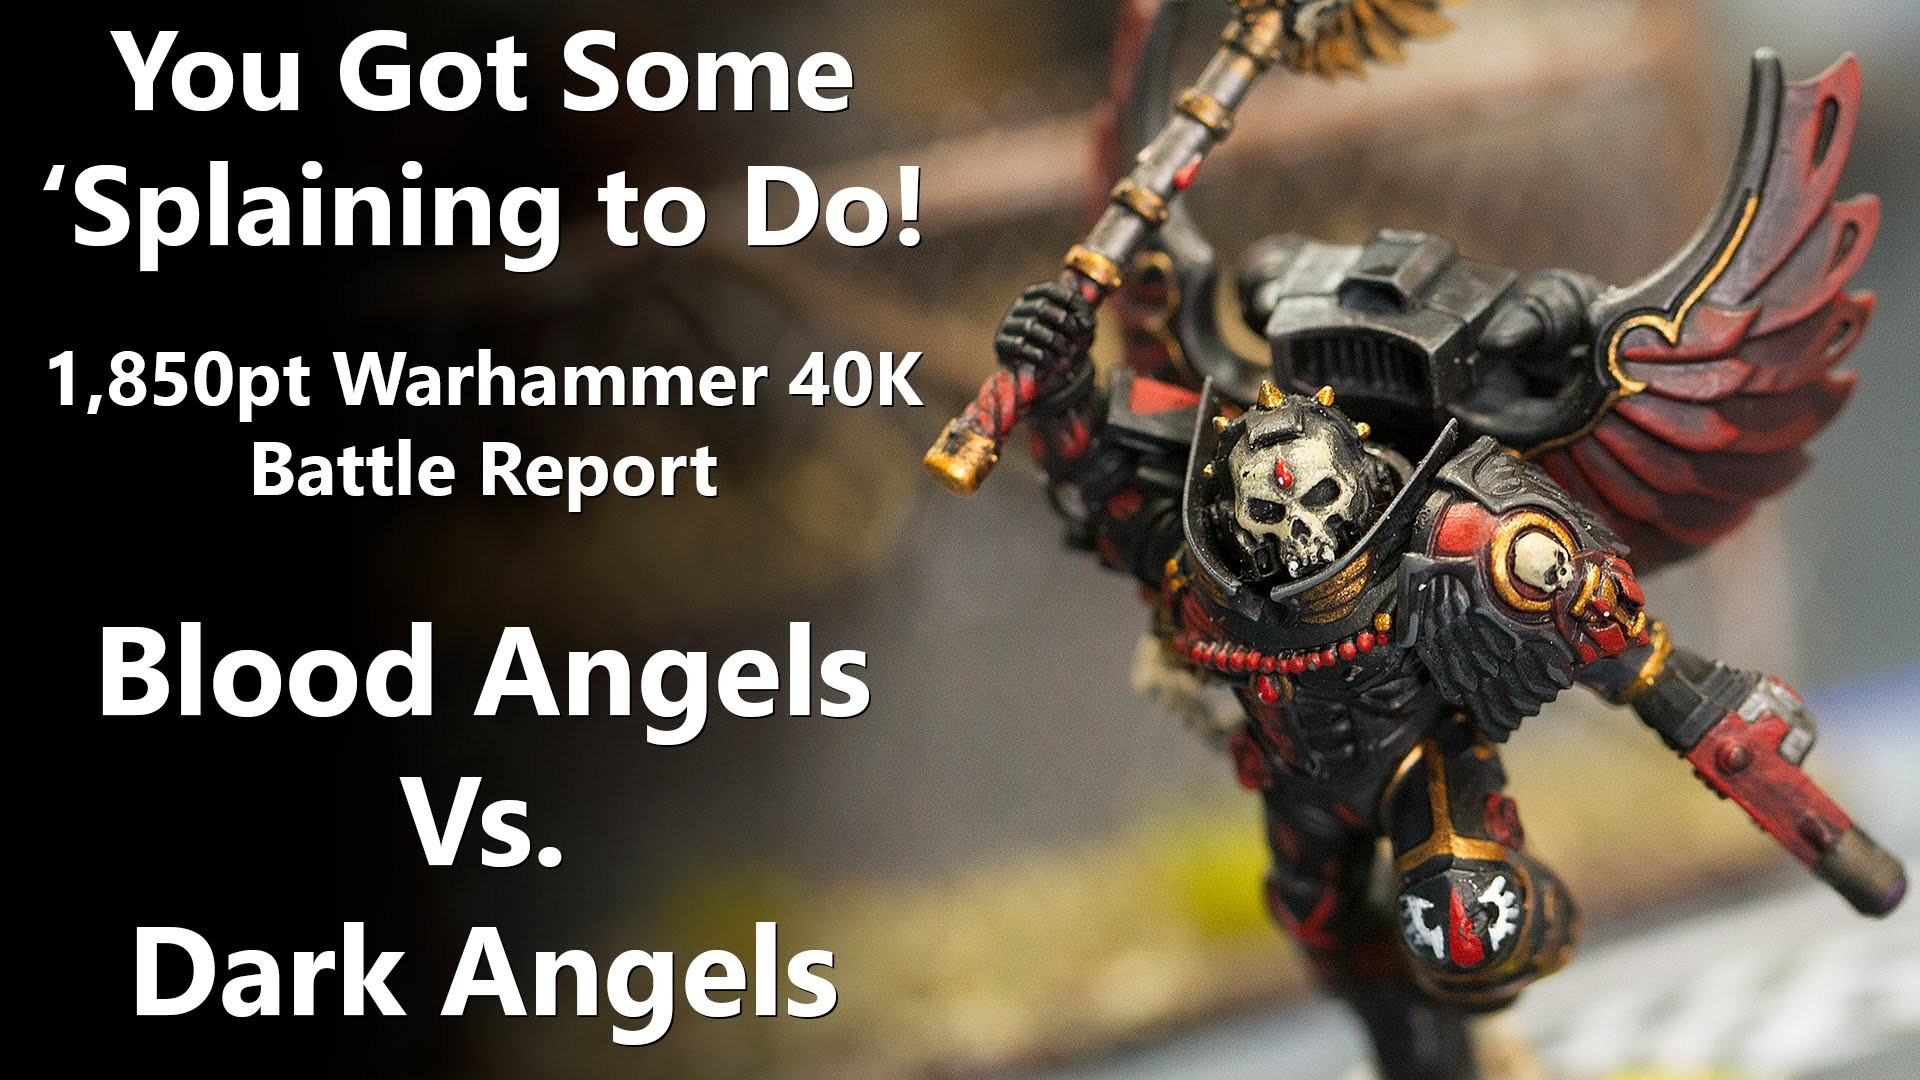 1,850pt Warhammer 40K Battle Report – Blood Angels Vs Dark Angels – YouTube